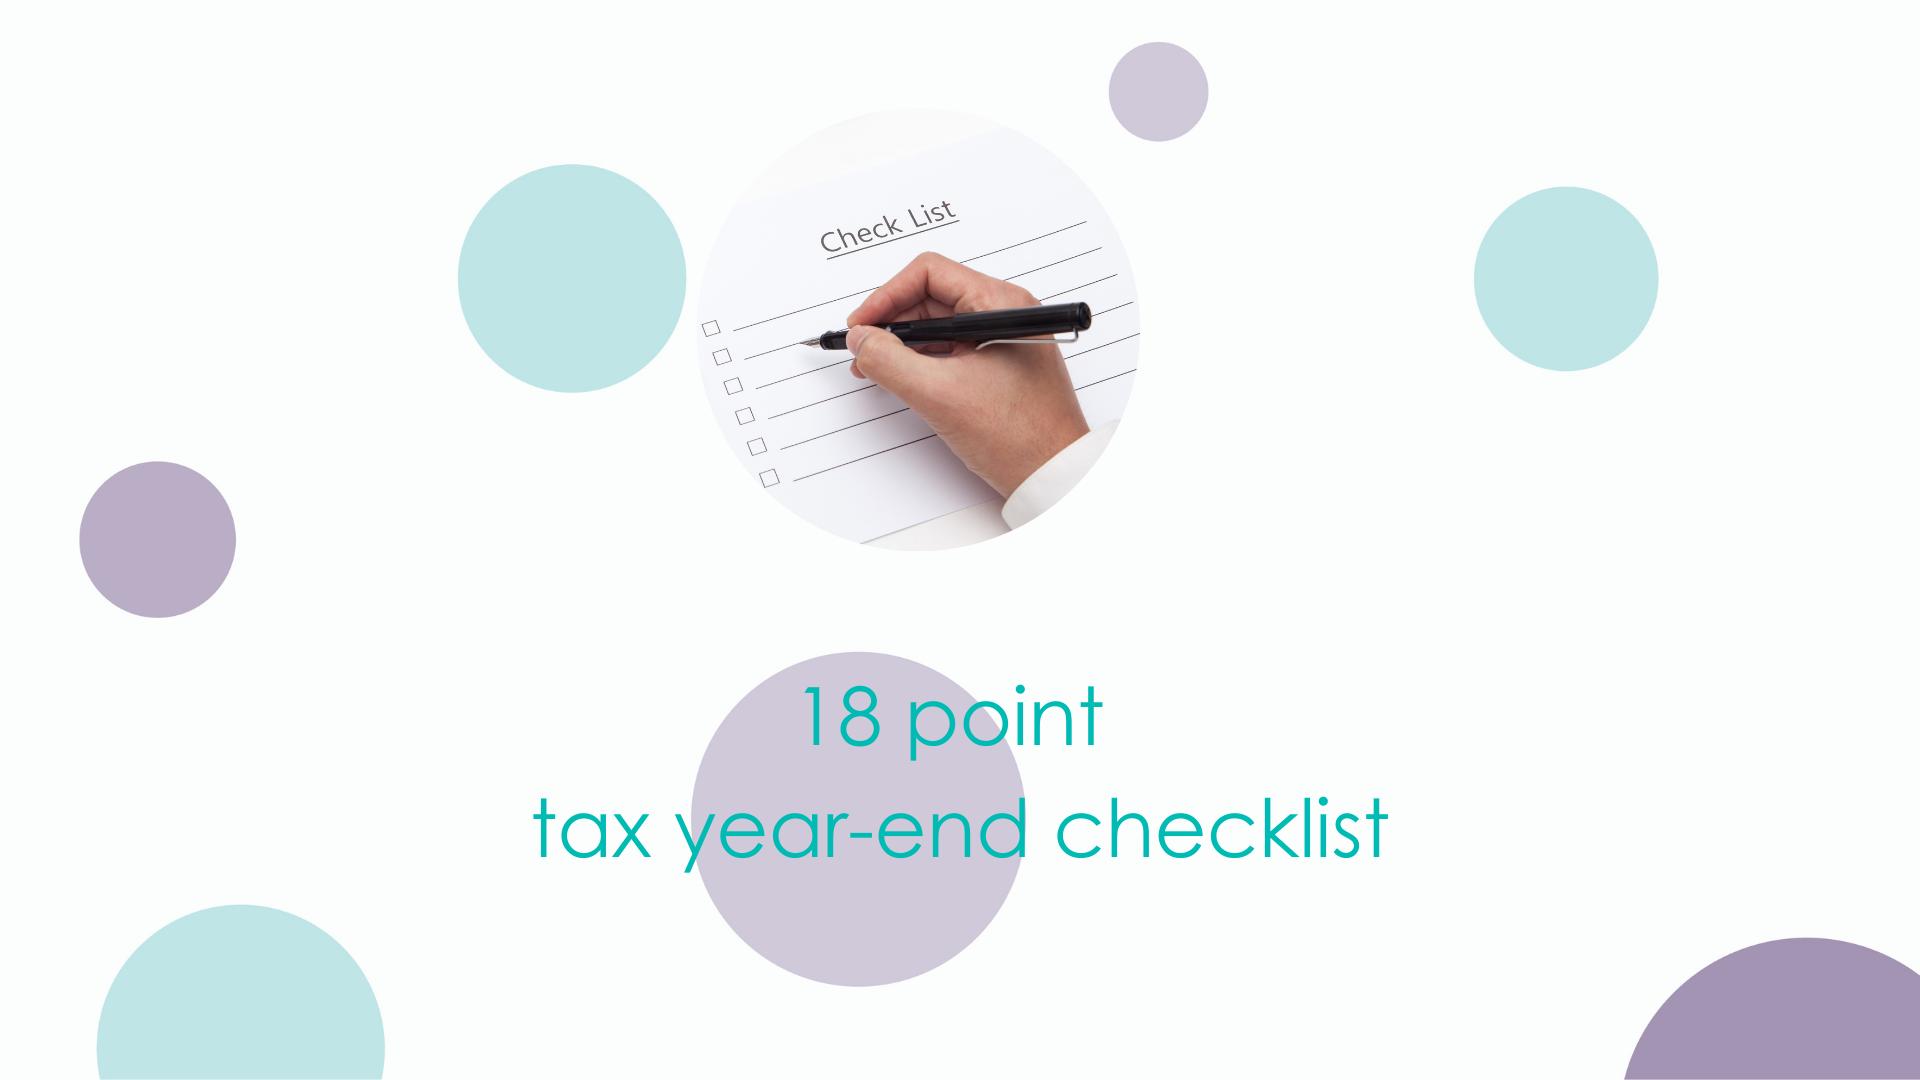 18 Point Tax Year End Checklist